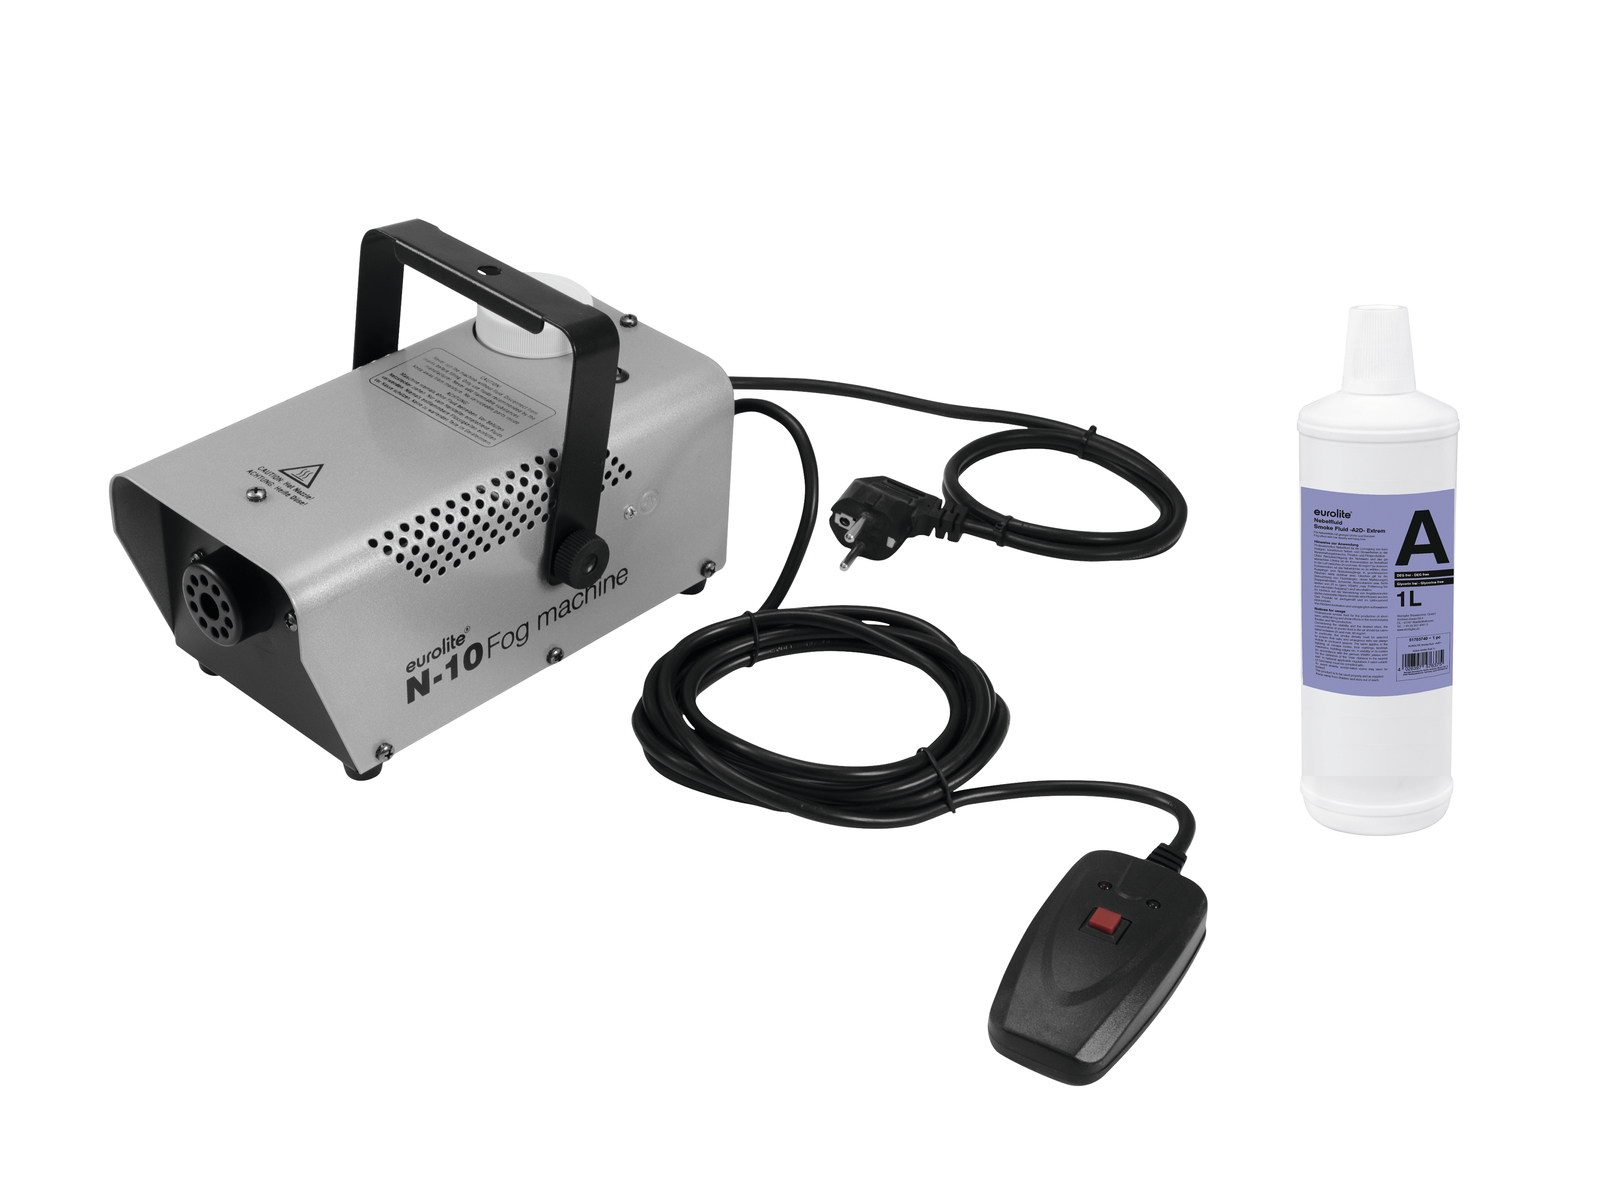 EUROLITE N Set-10 macchina del Fumo + A2D Azione di fumo liquido 1l